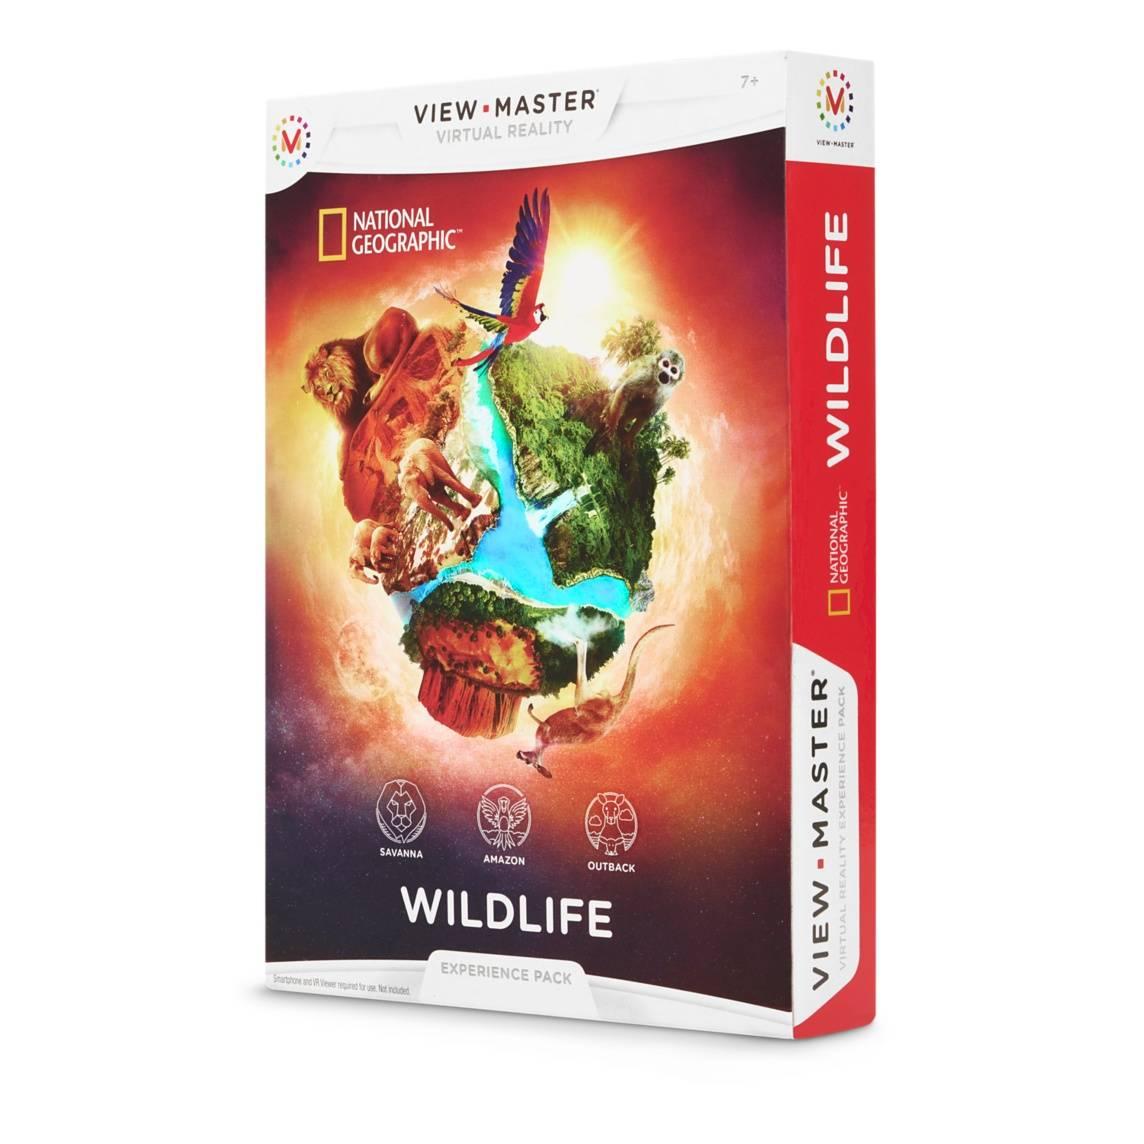 view-master-wildlife